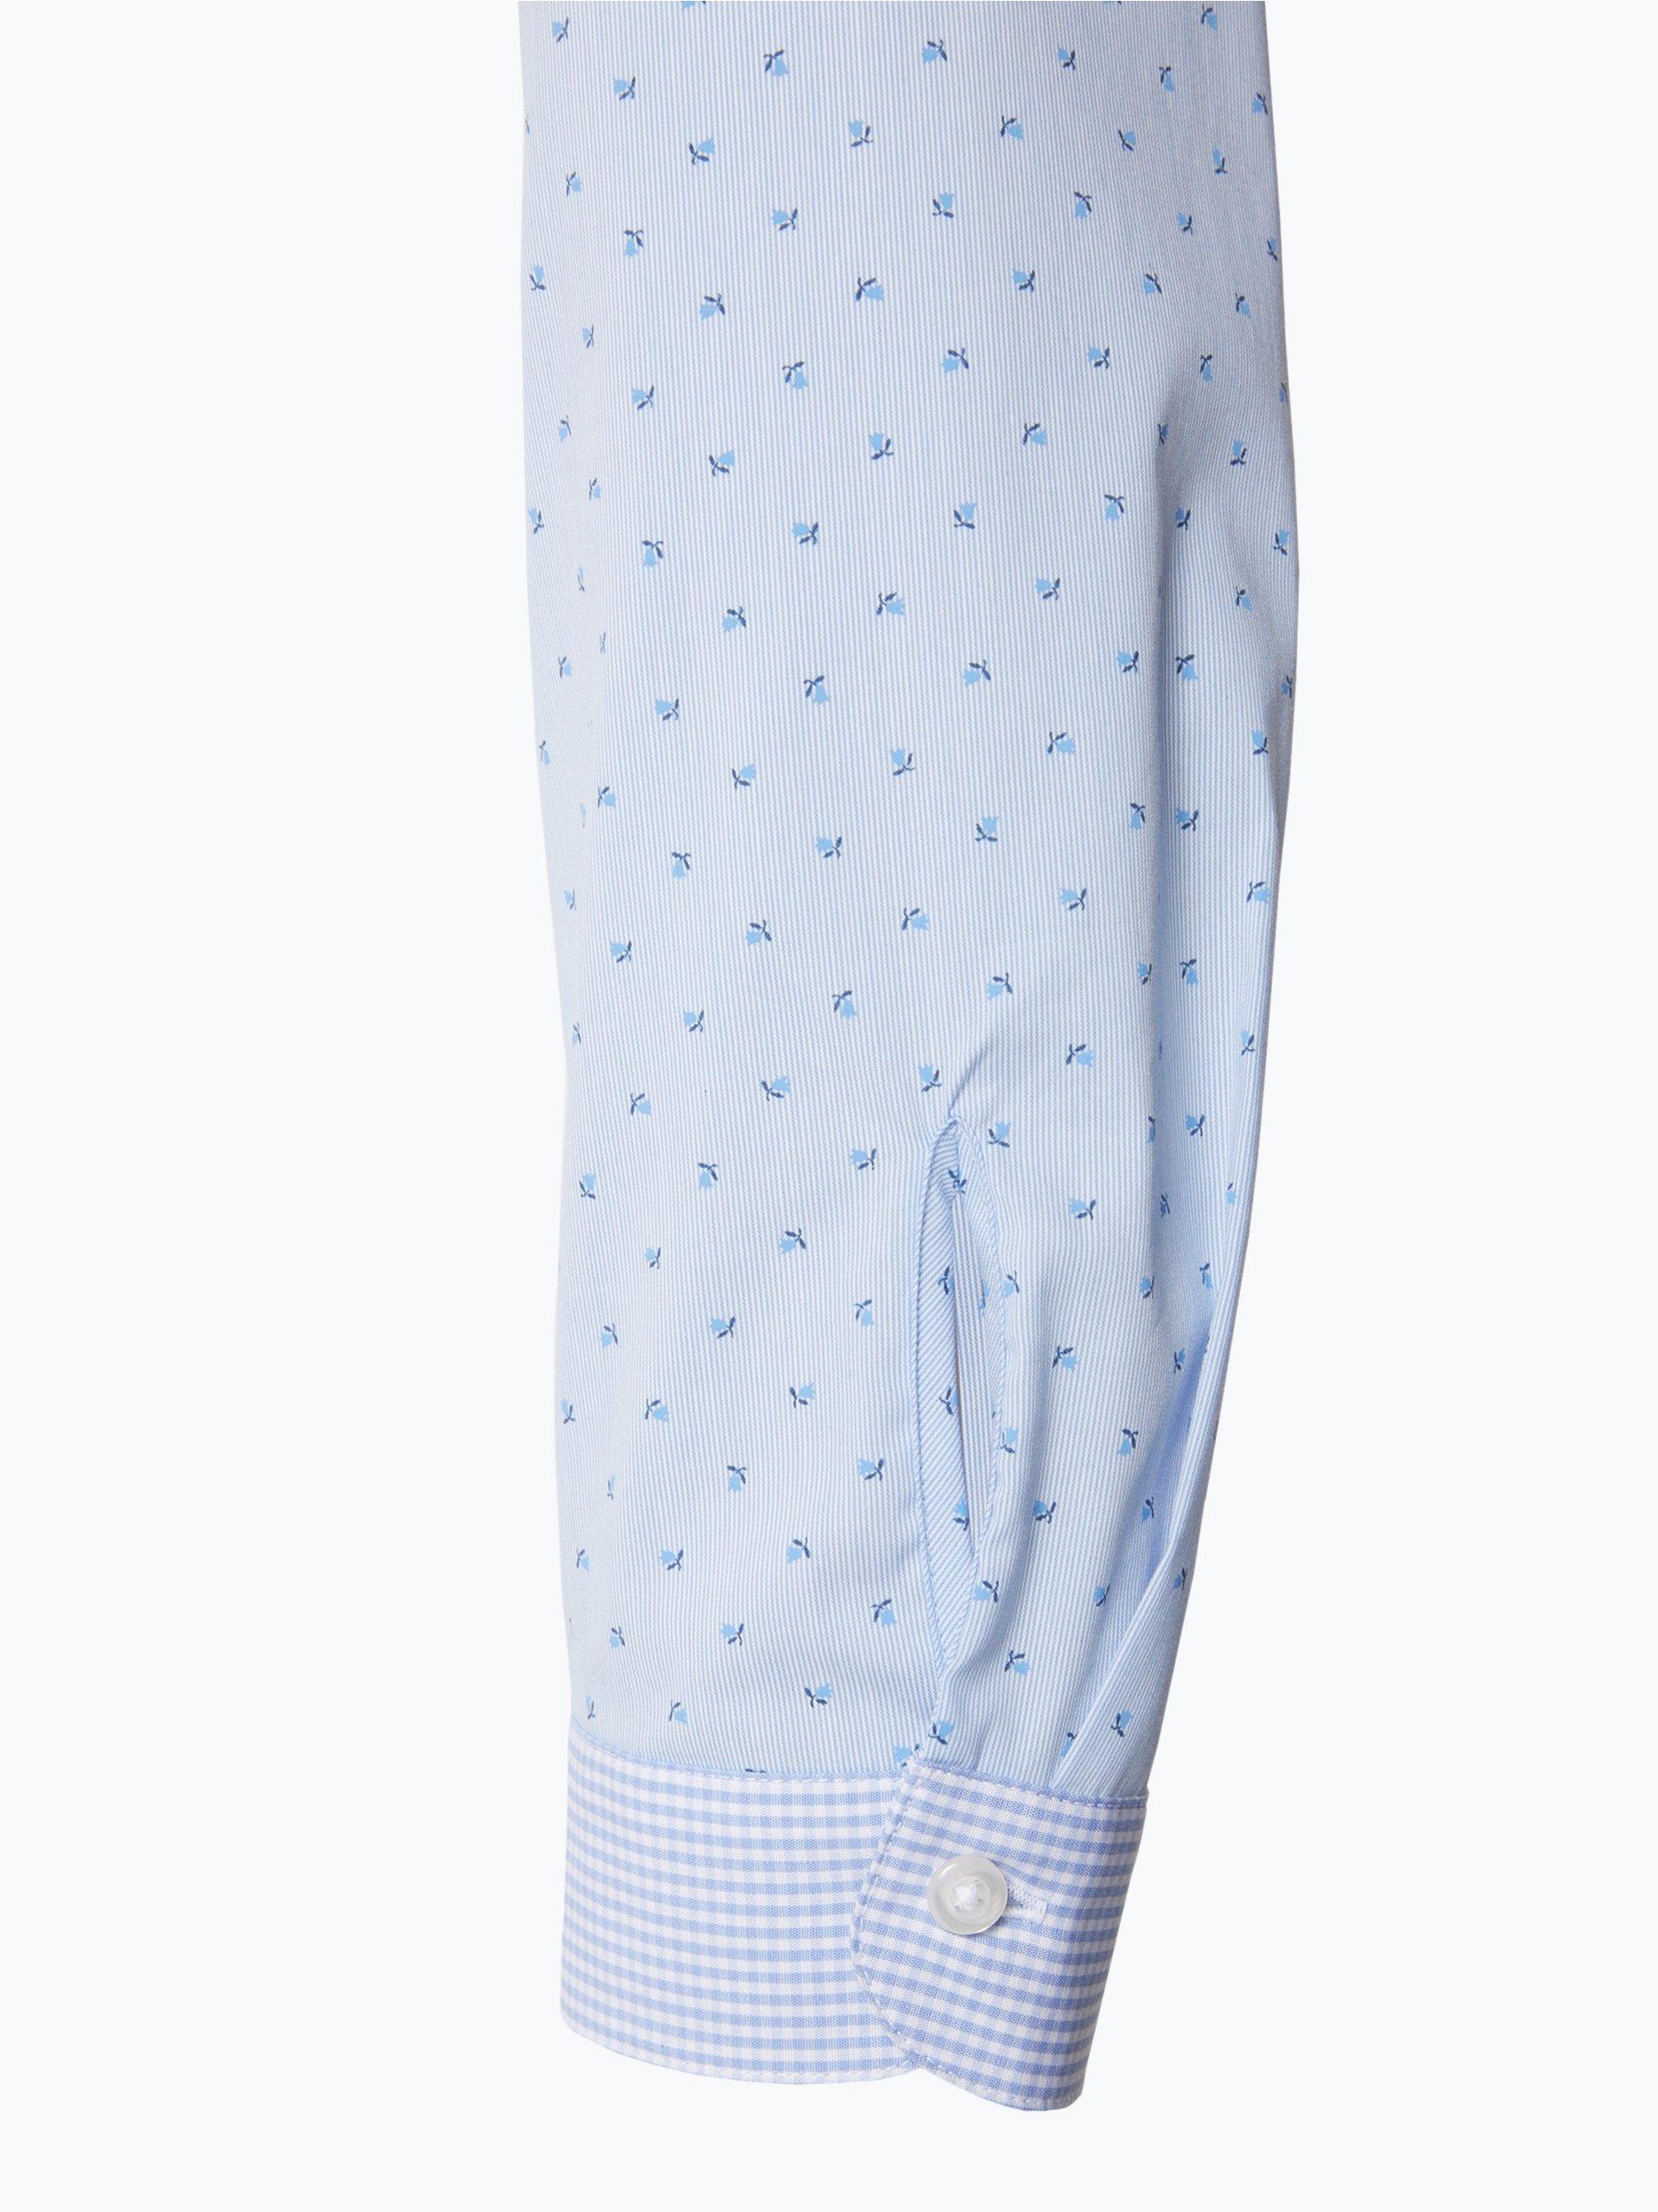 seidensticker schwarze rose damen bluse hellblau blau gestreift online kaufen vangraaf com. Black Bedroom Furniture Sets. Home Design Ideas